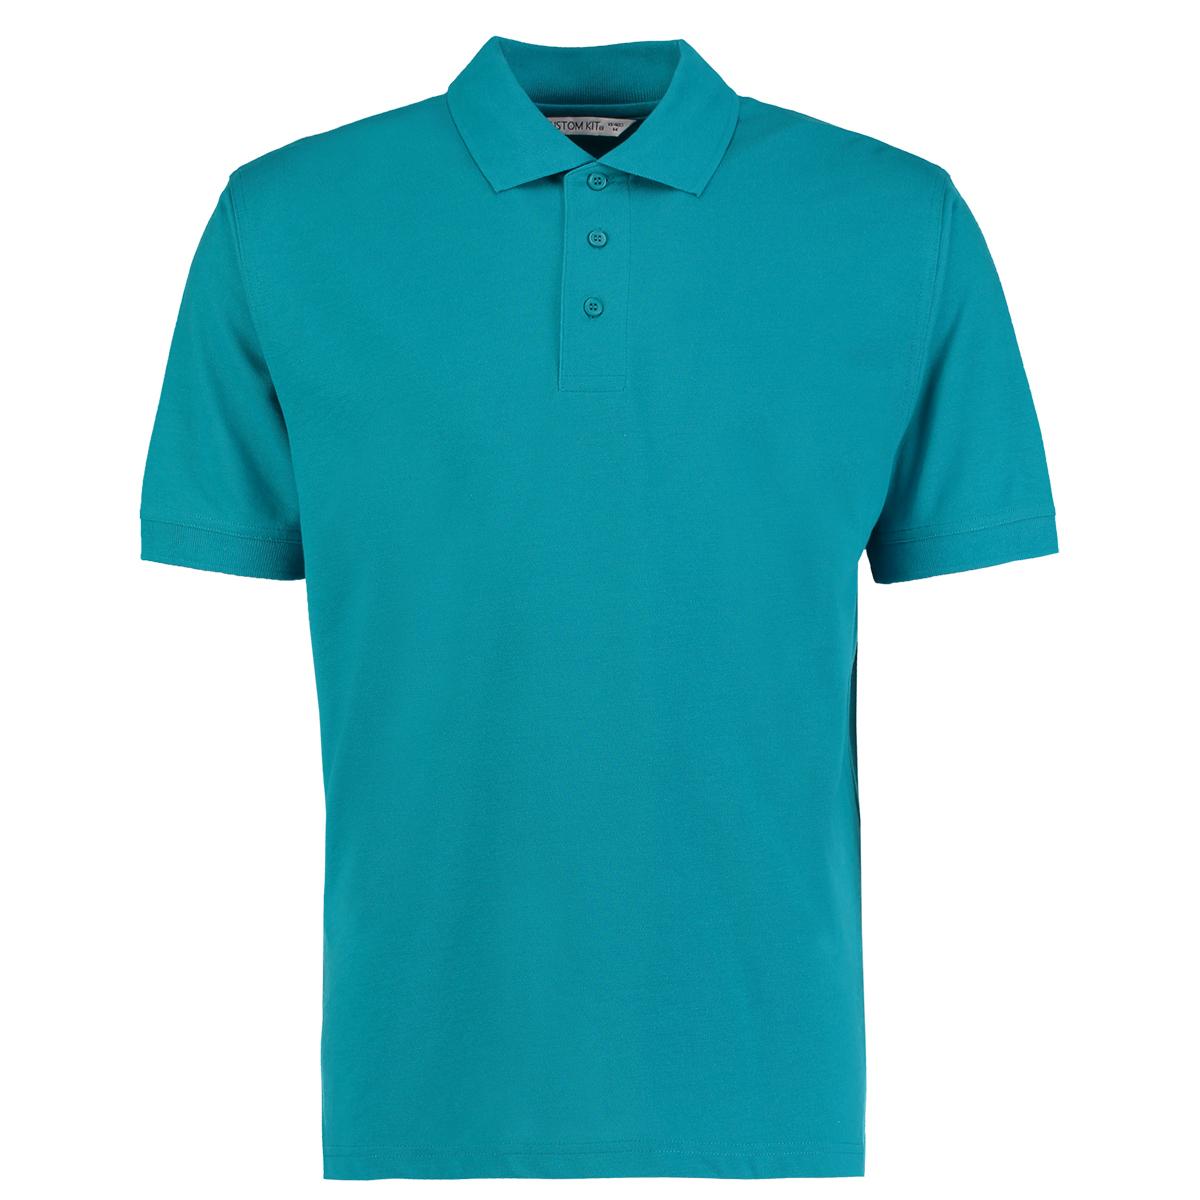 Kustom Kit Uomo Classico Polo T-shirt KK403 Comfort Casual Fashion Wear Maglia Top